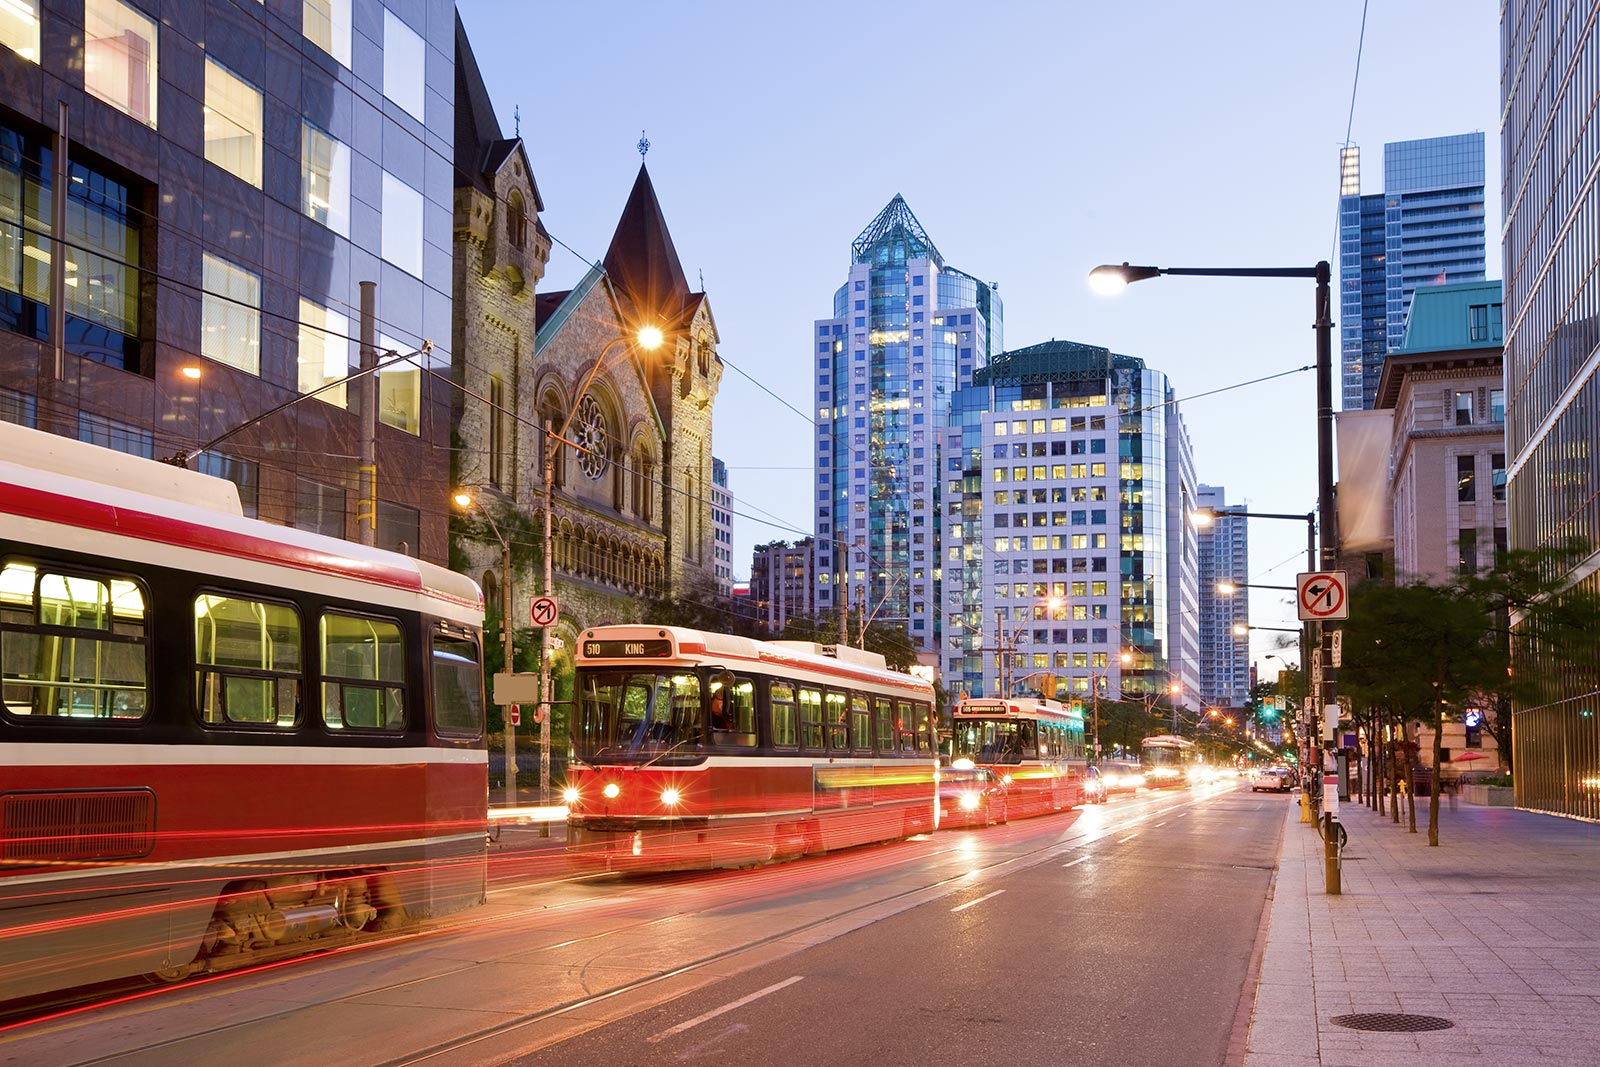 Copy Entertainment King Trans Toronto Escort Downtown St. District Text